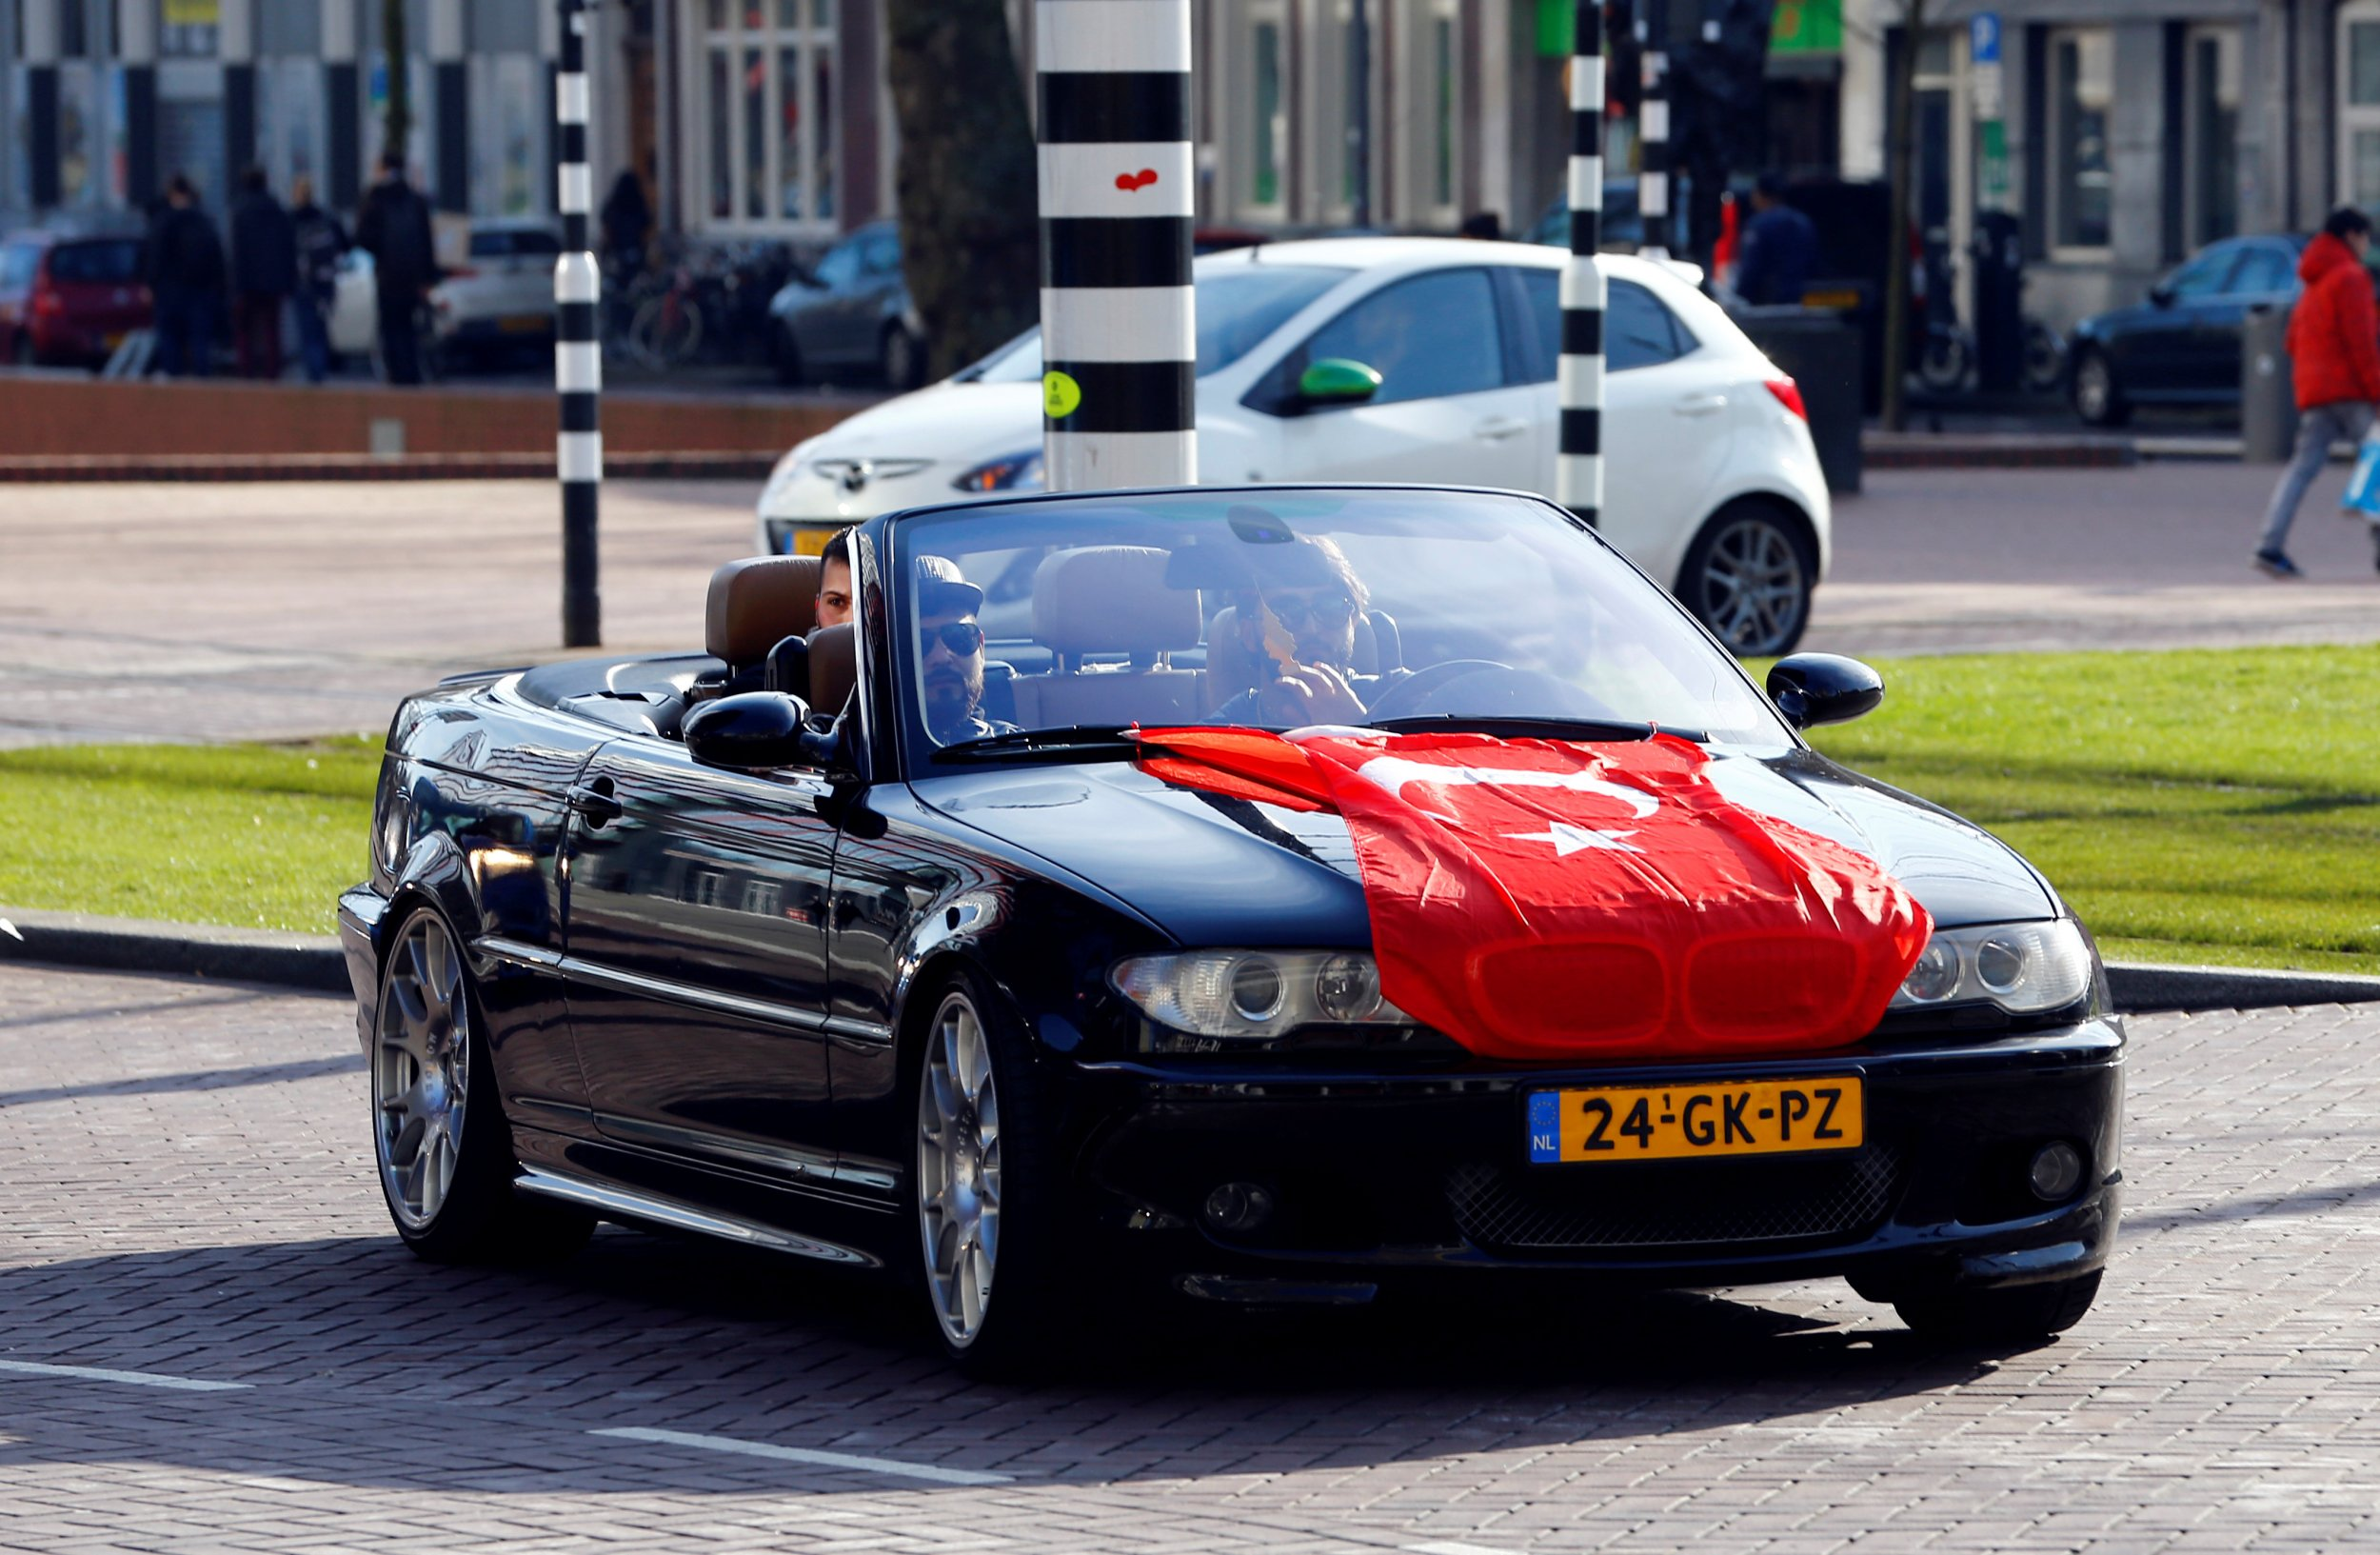 Turkey flag on car in Netherlands